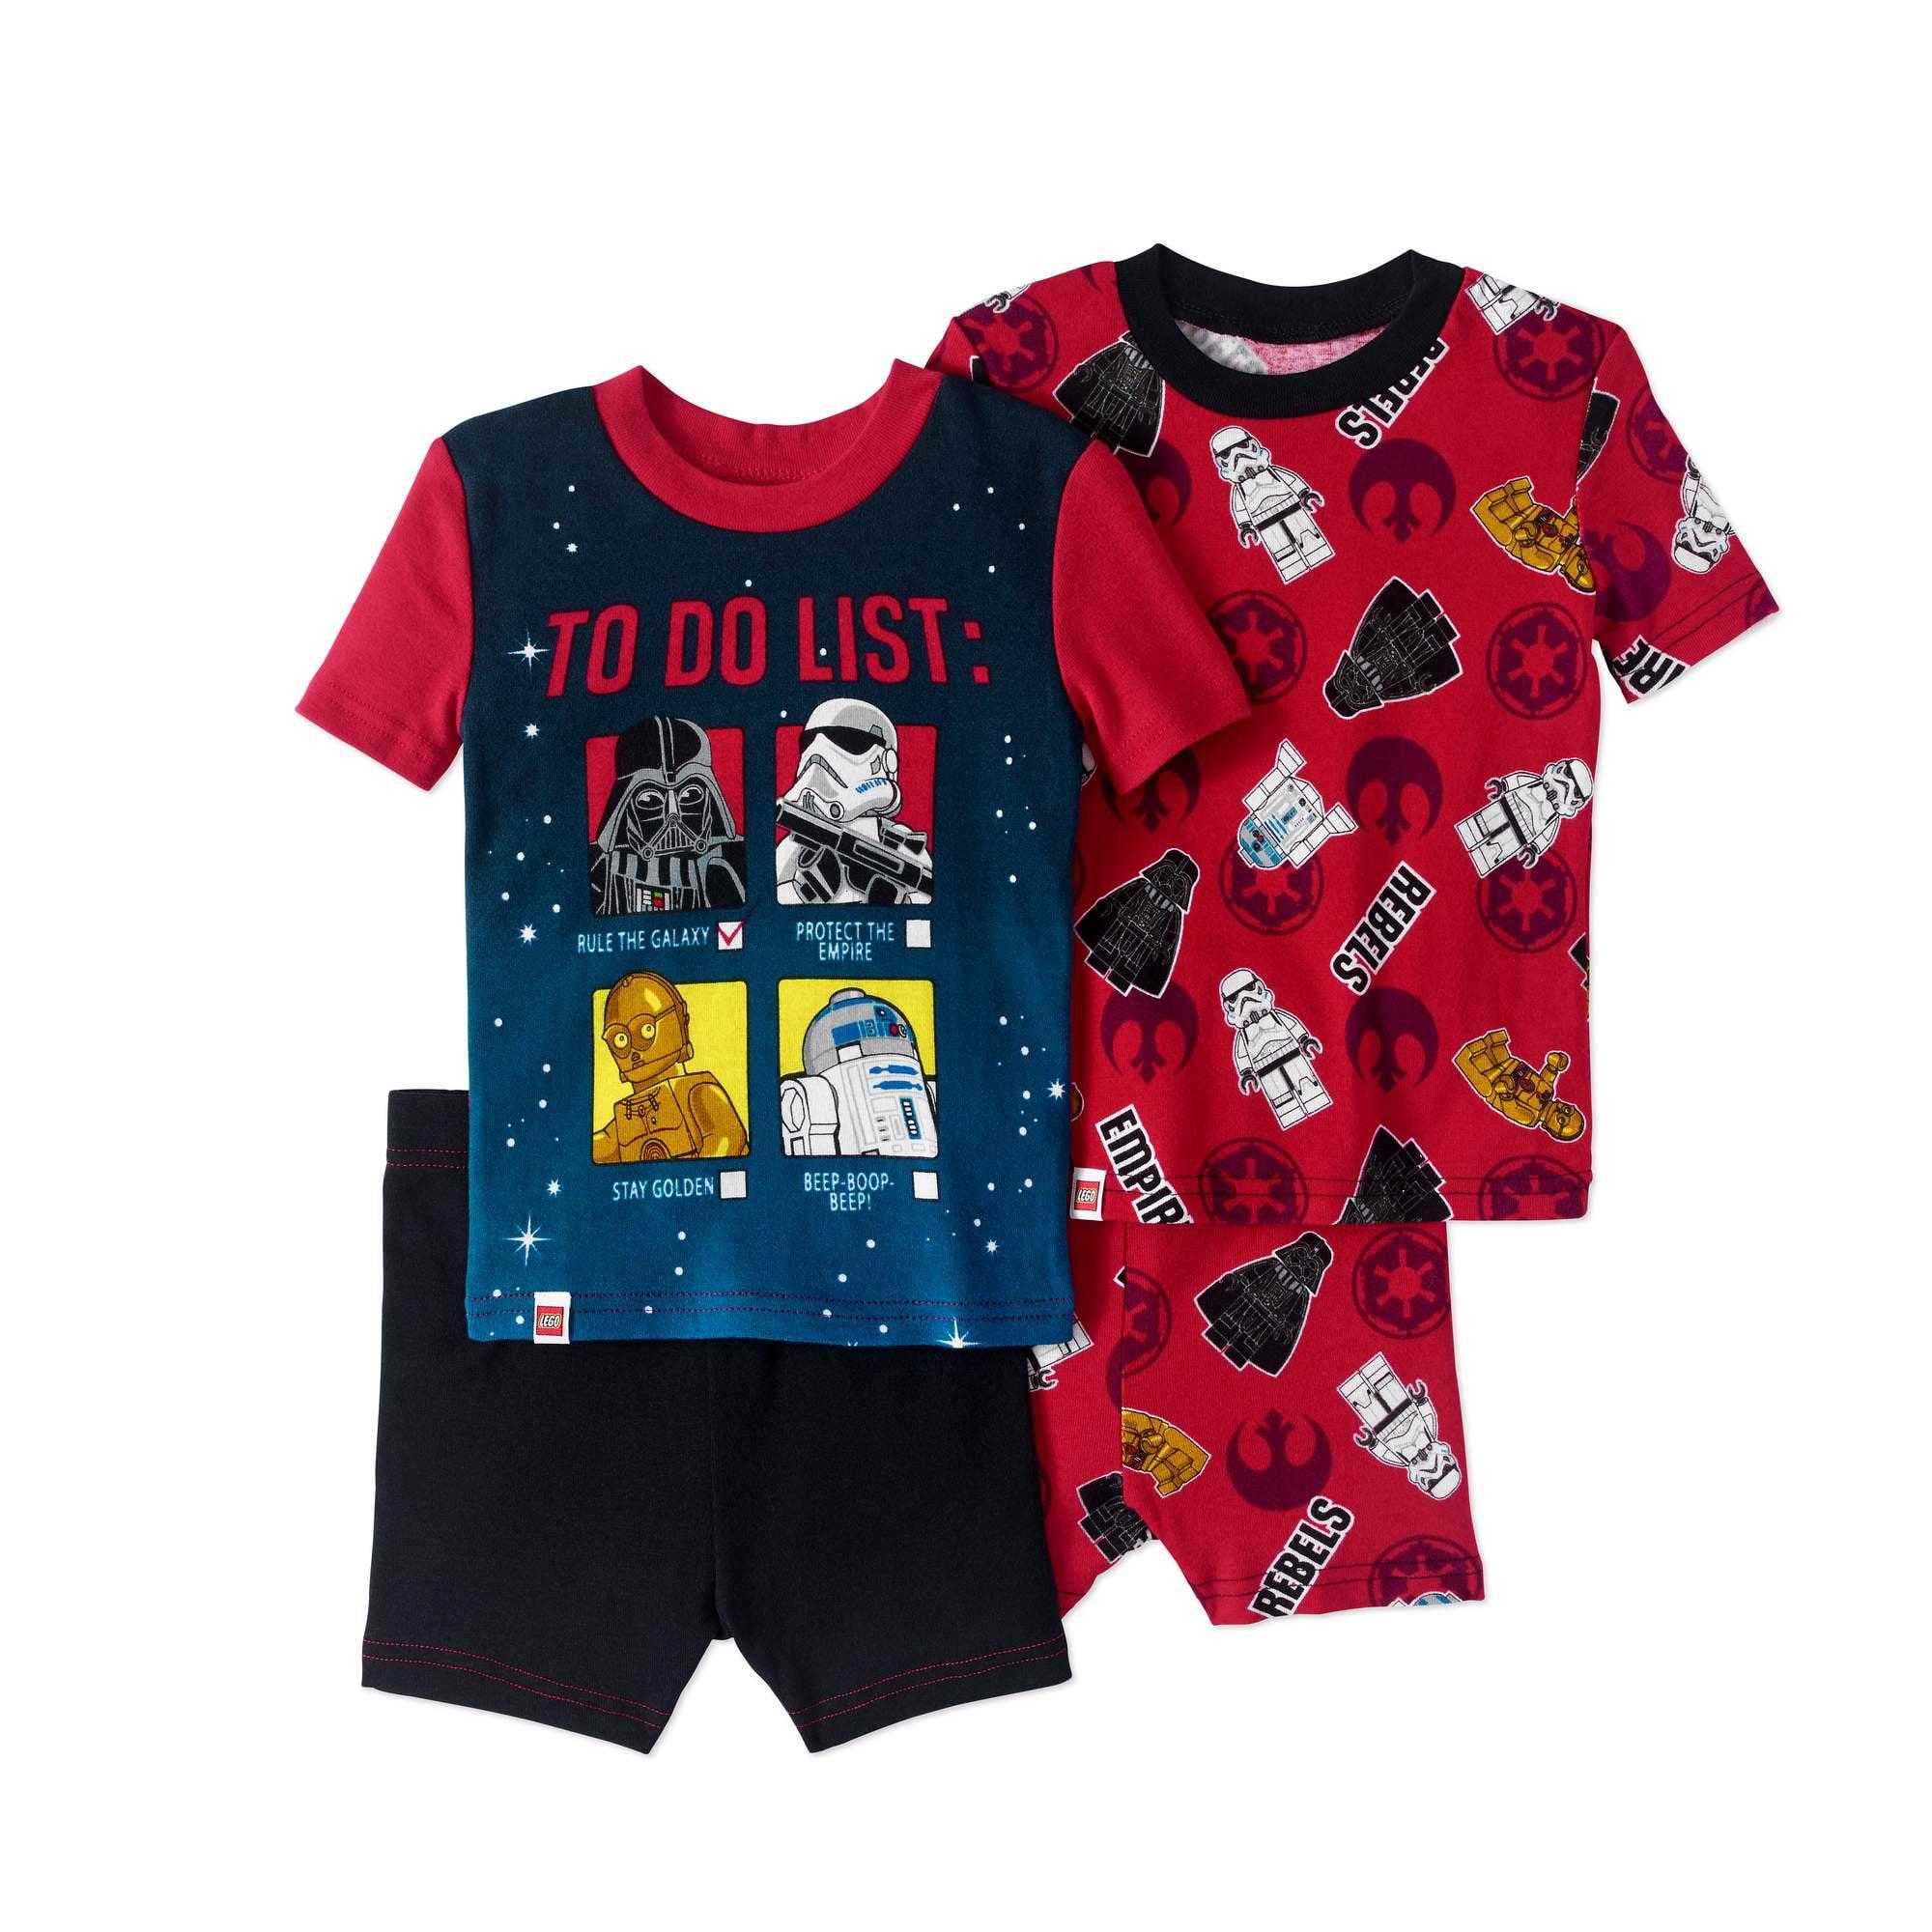 Lego Star Wars Boys' 4 Piece Pajama Short Set